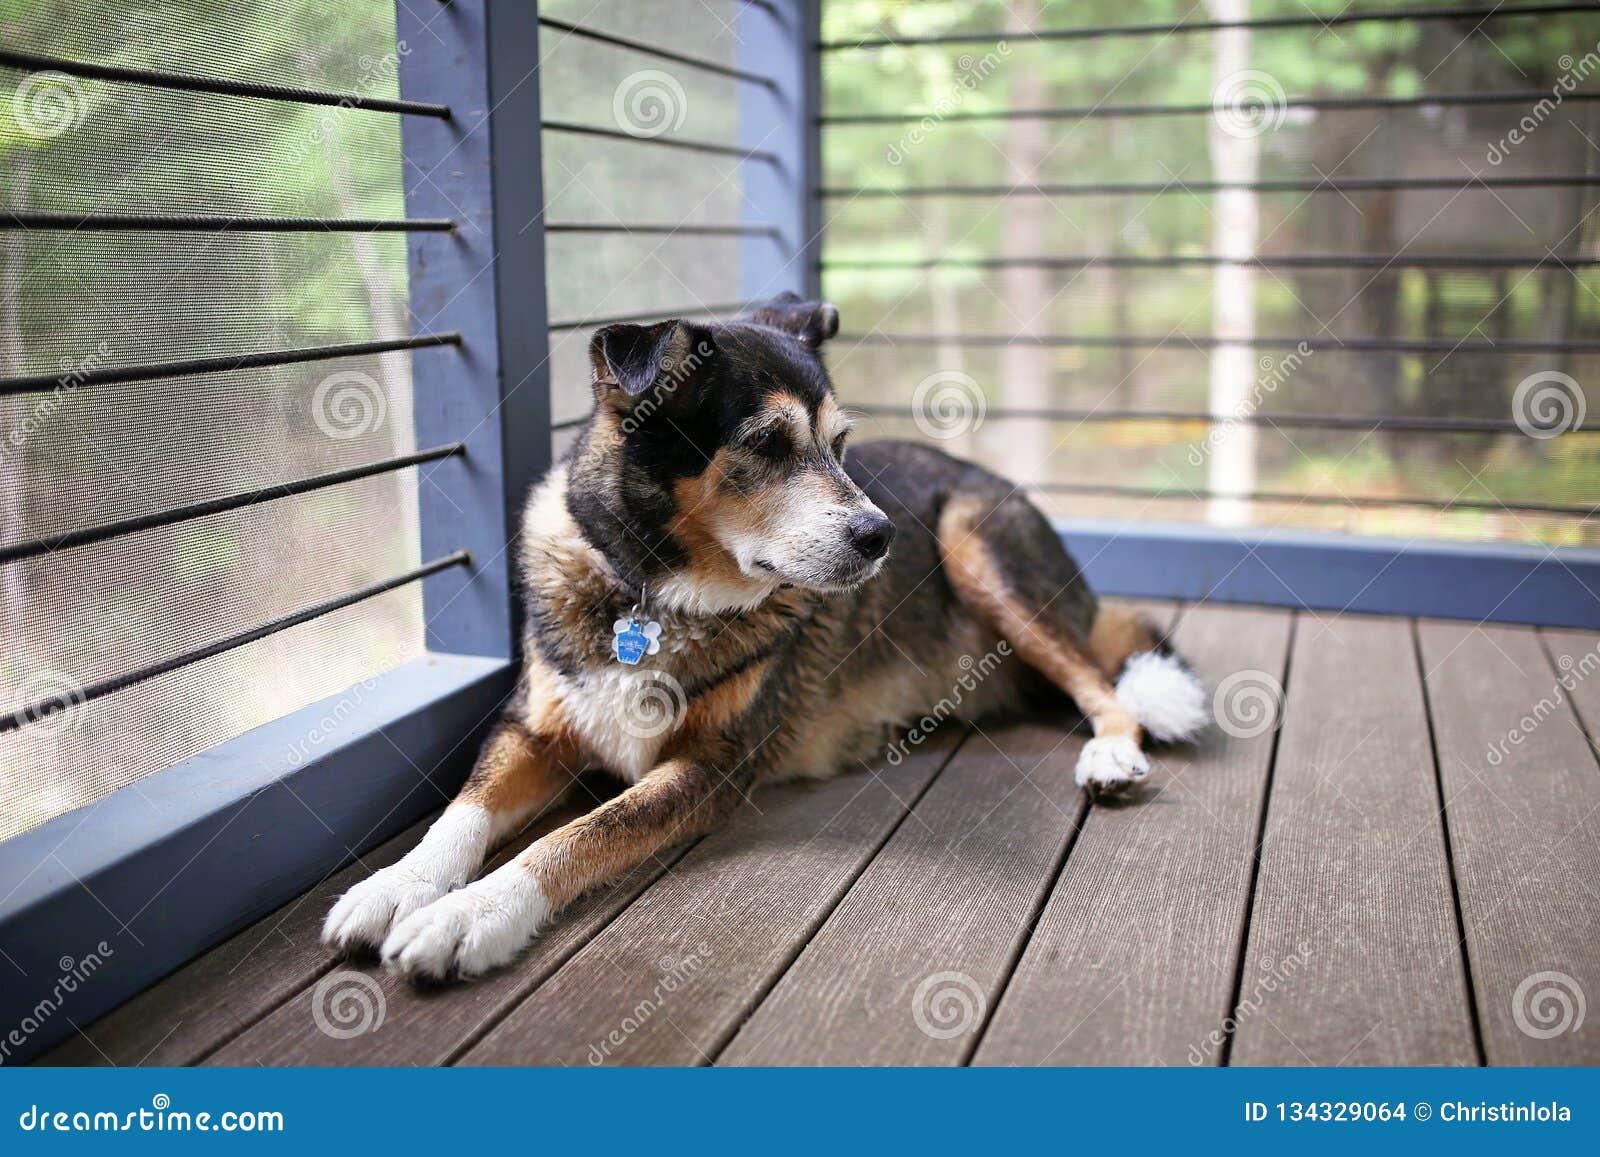 Beautiful German Shepherd Mix Breed Dog Keeping Watch from Cabin Porch